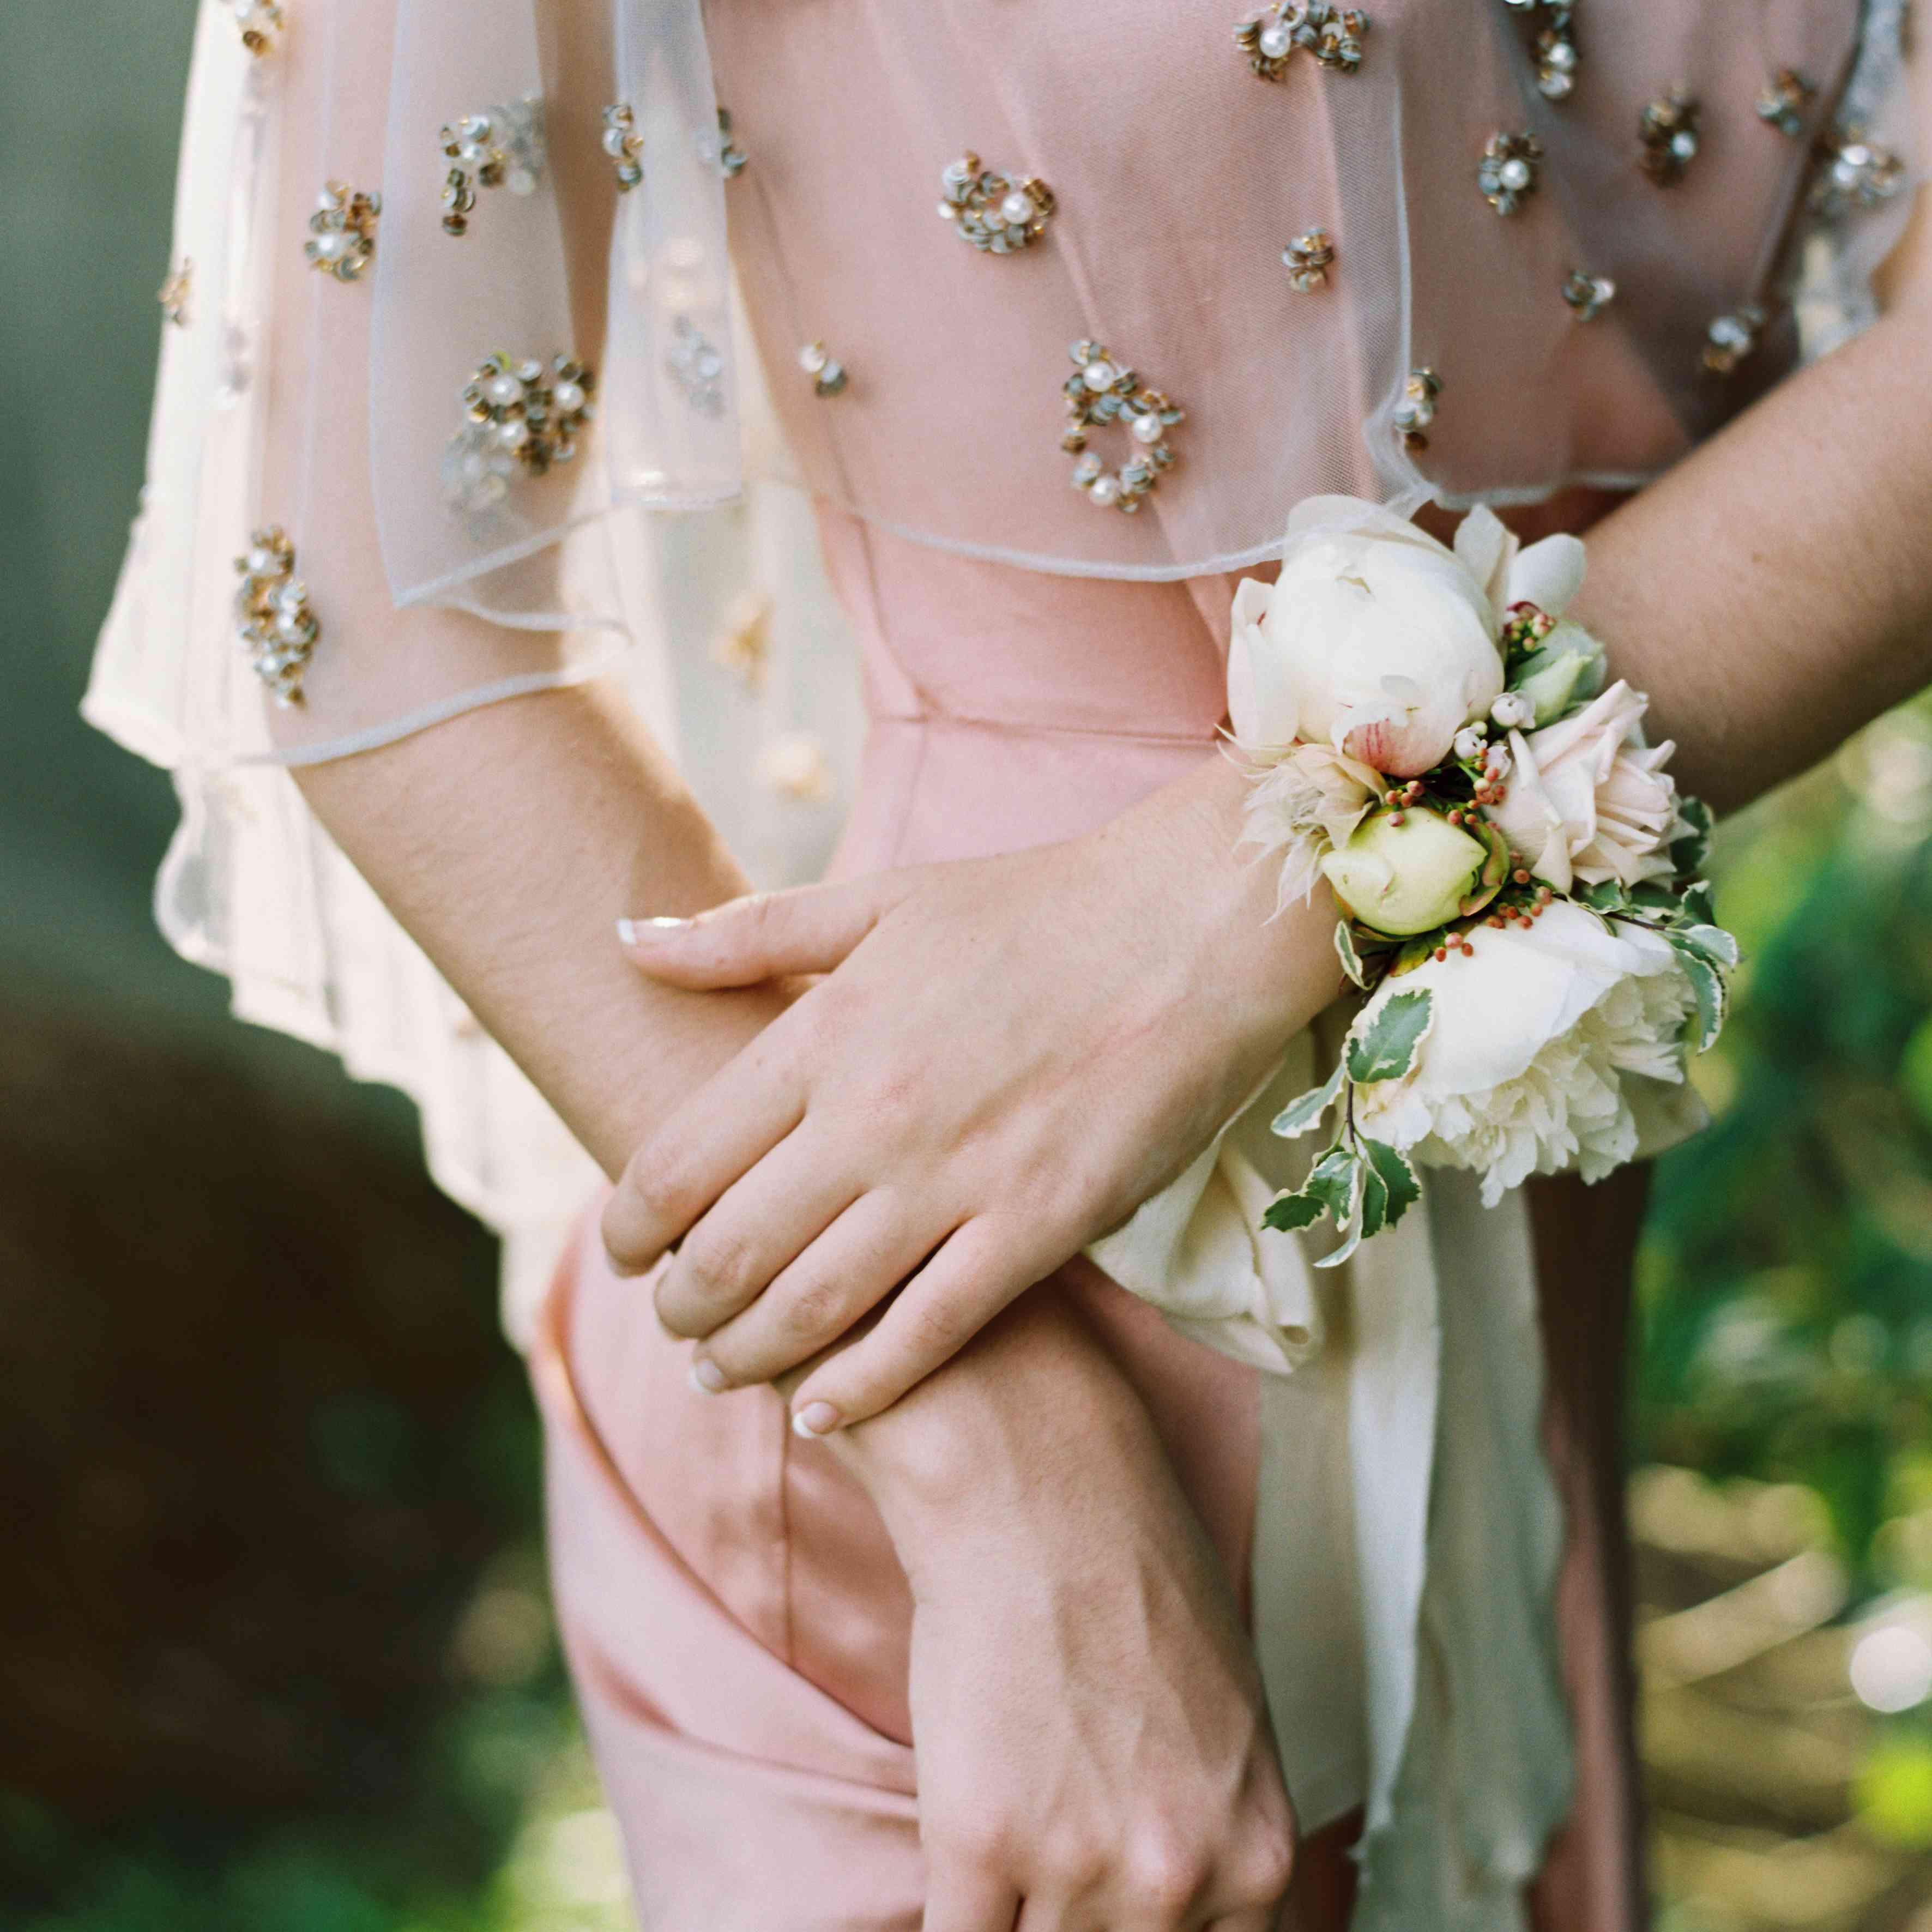 Corsage Wedding Bridal Corsage Guest Corsage Flower Corsage M Silver